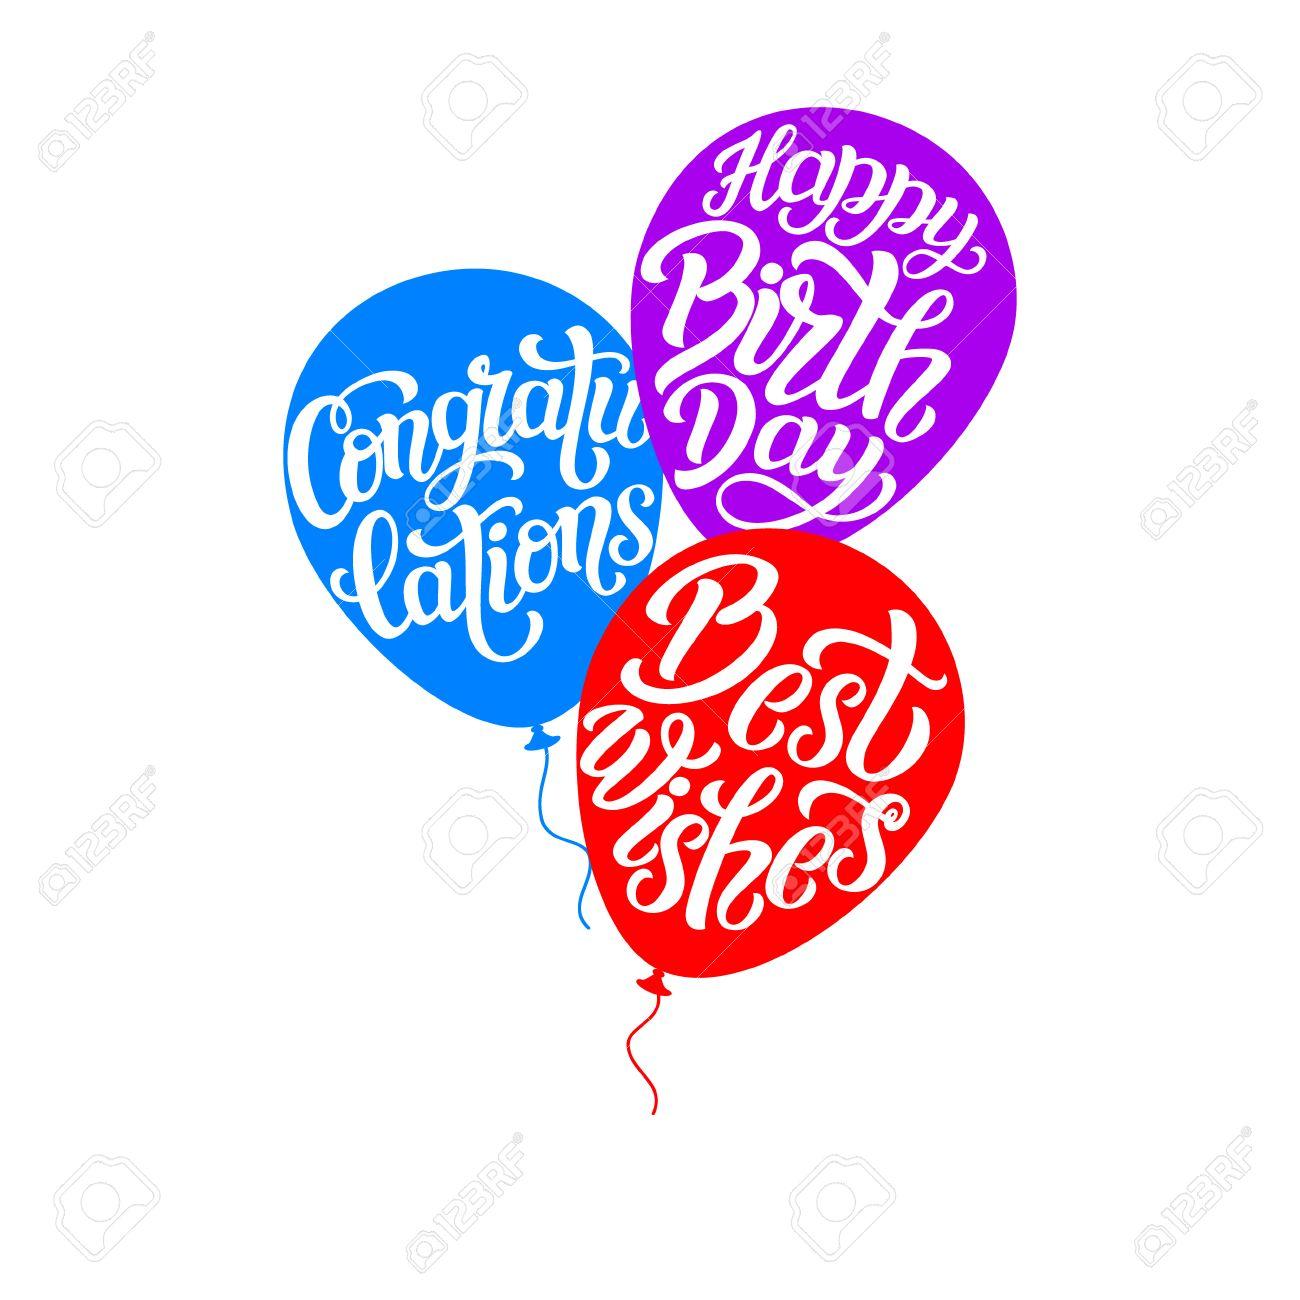 happy birthday congratulations best